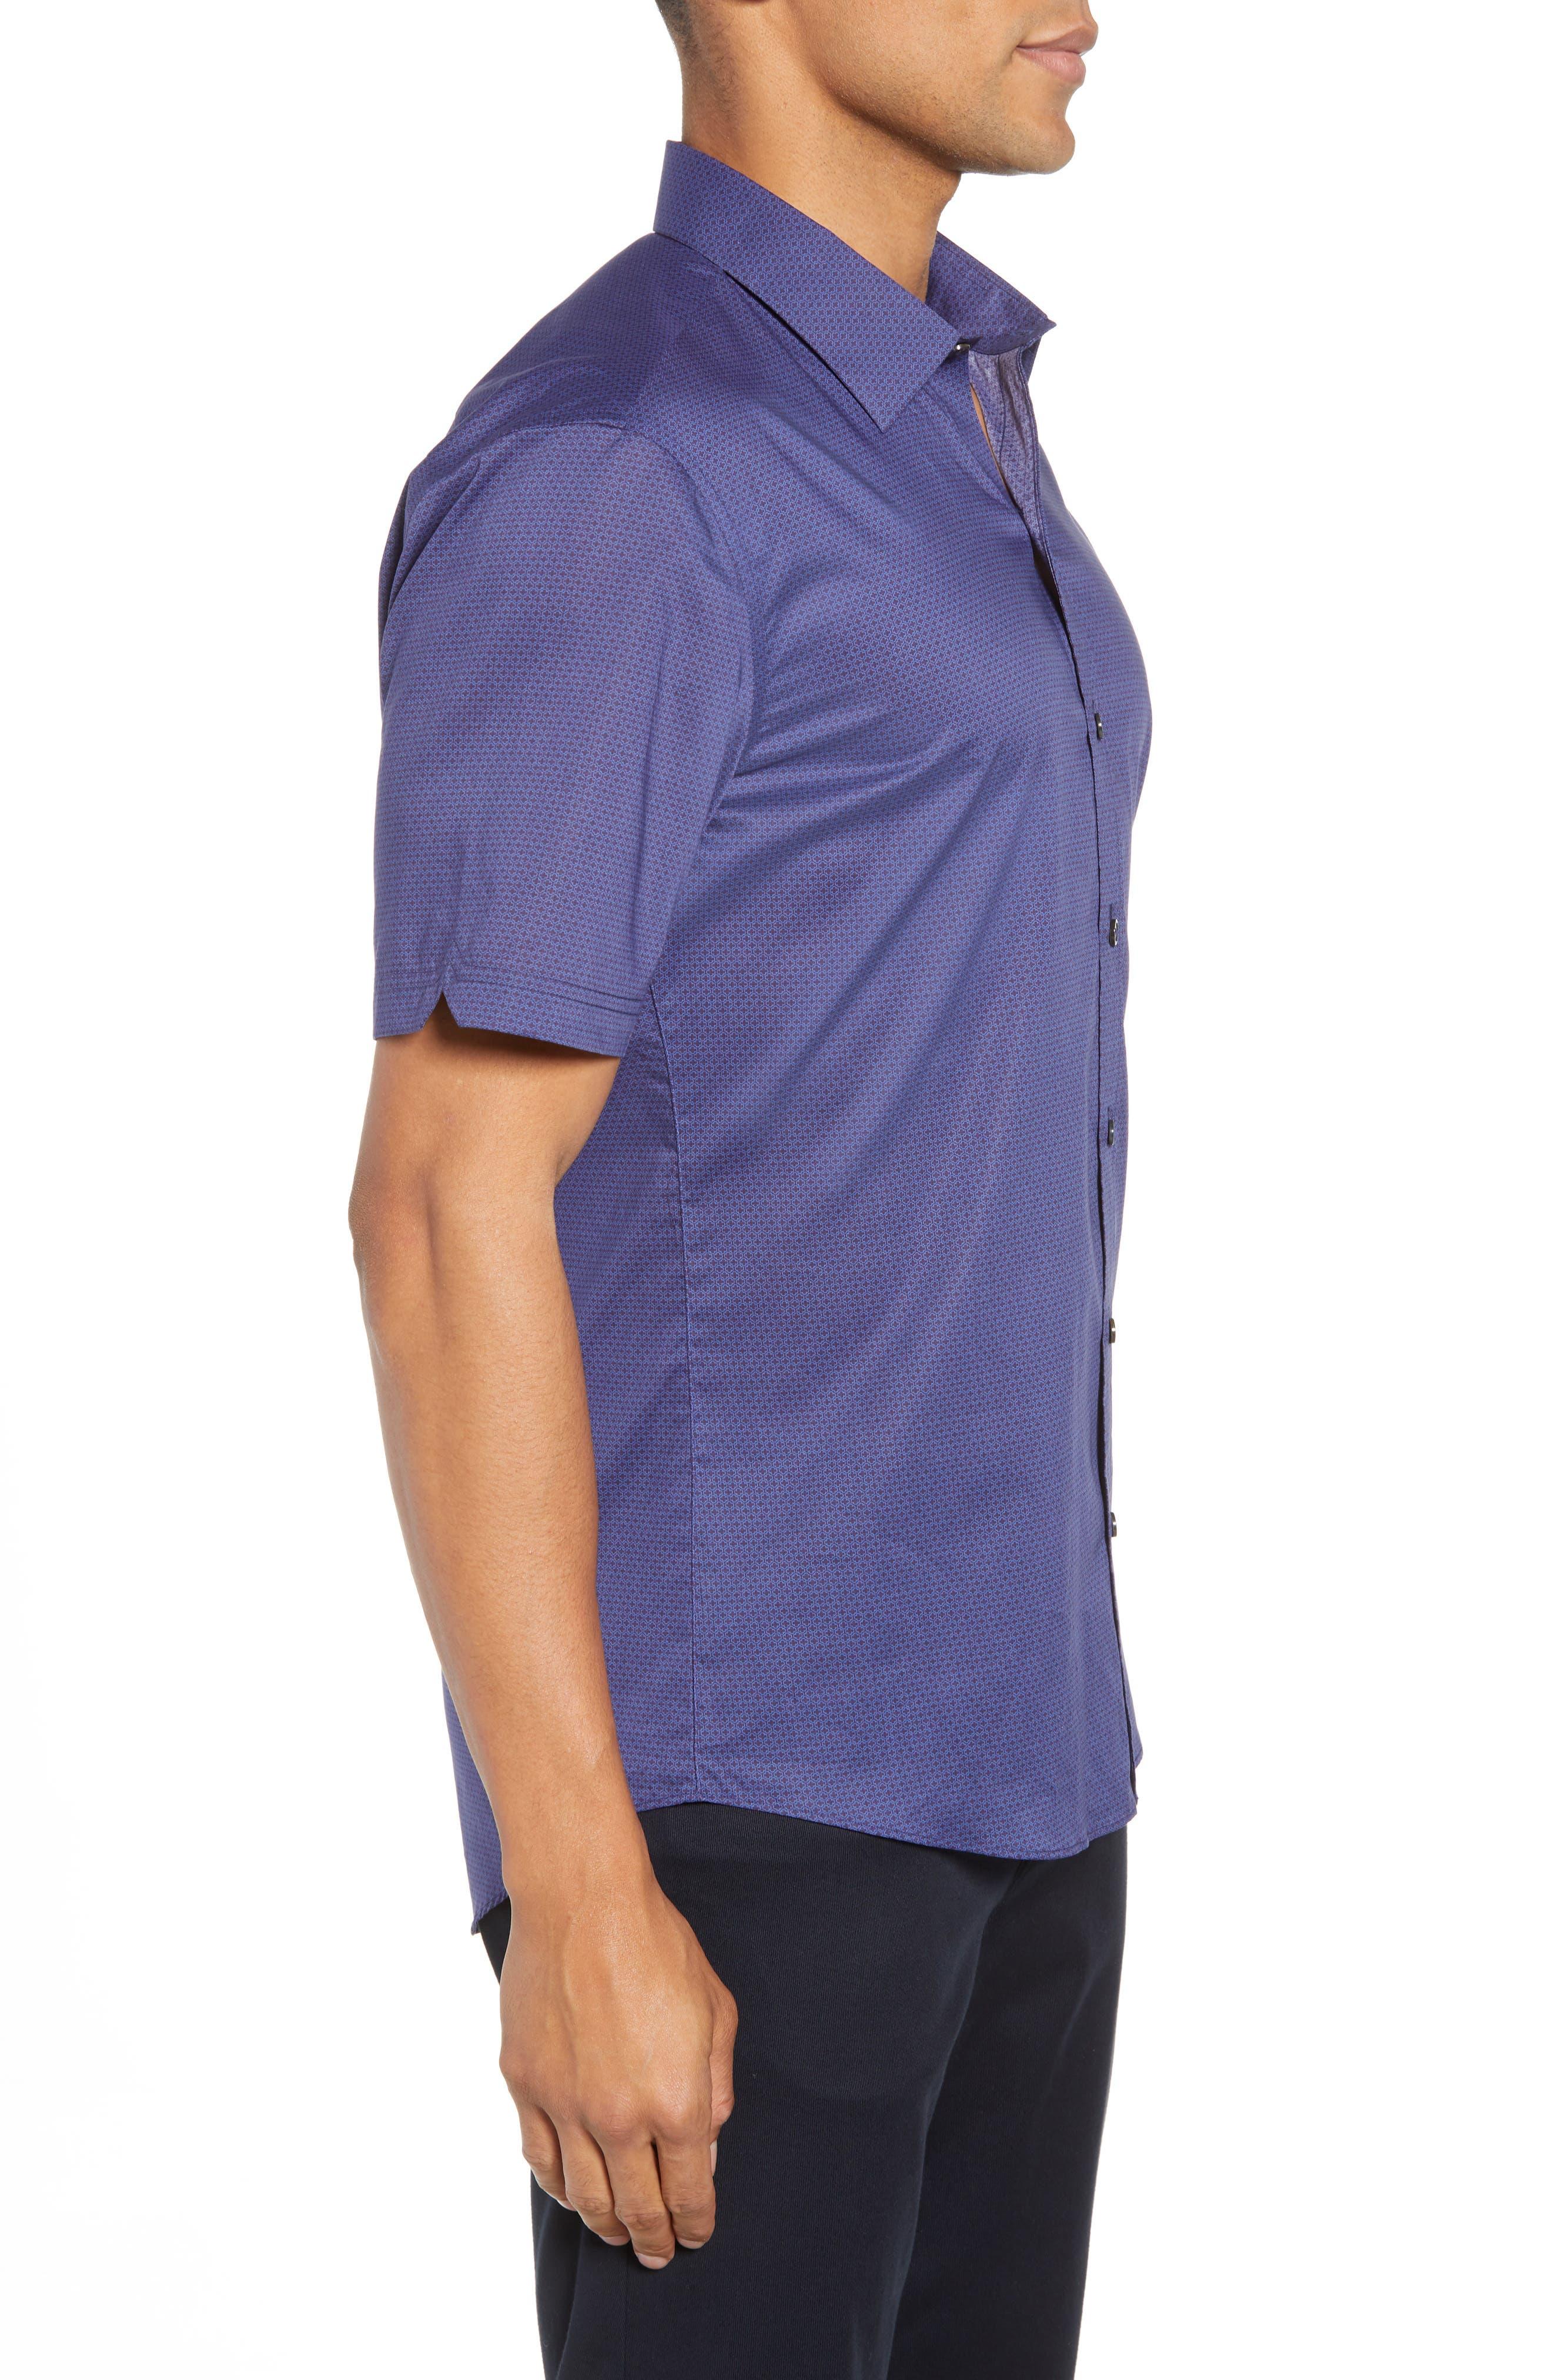 Avellan Regular Fit Sport Shirt,                             Alternate thumbnail 3, color,                             BLUE